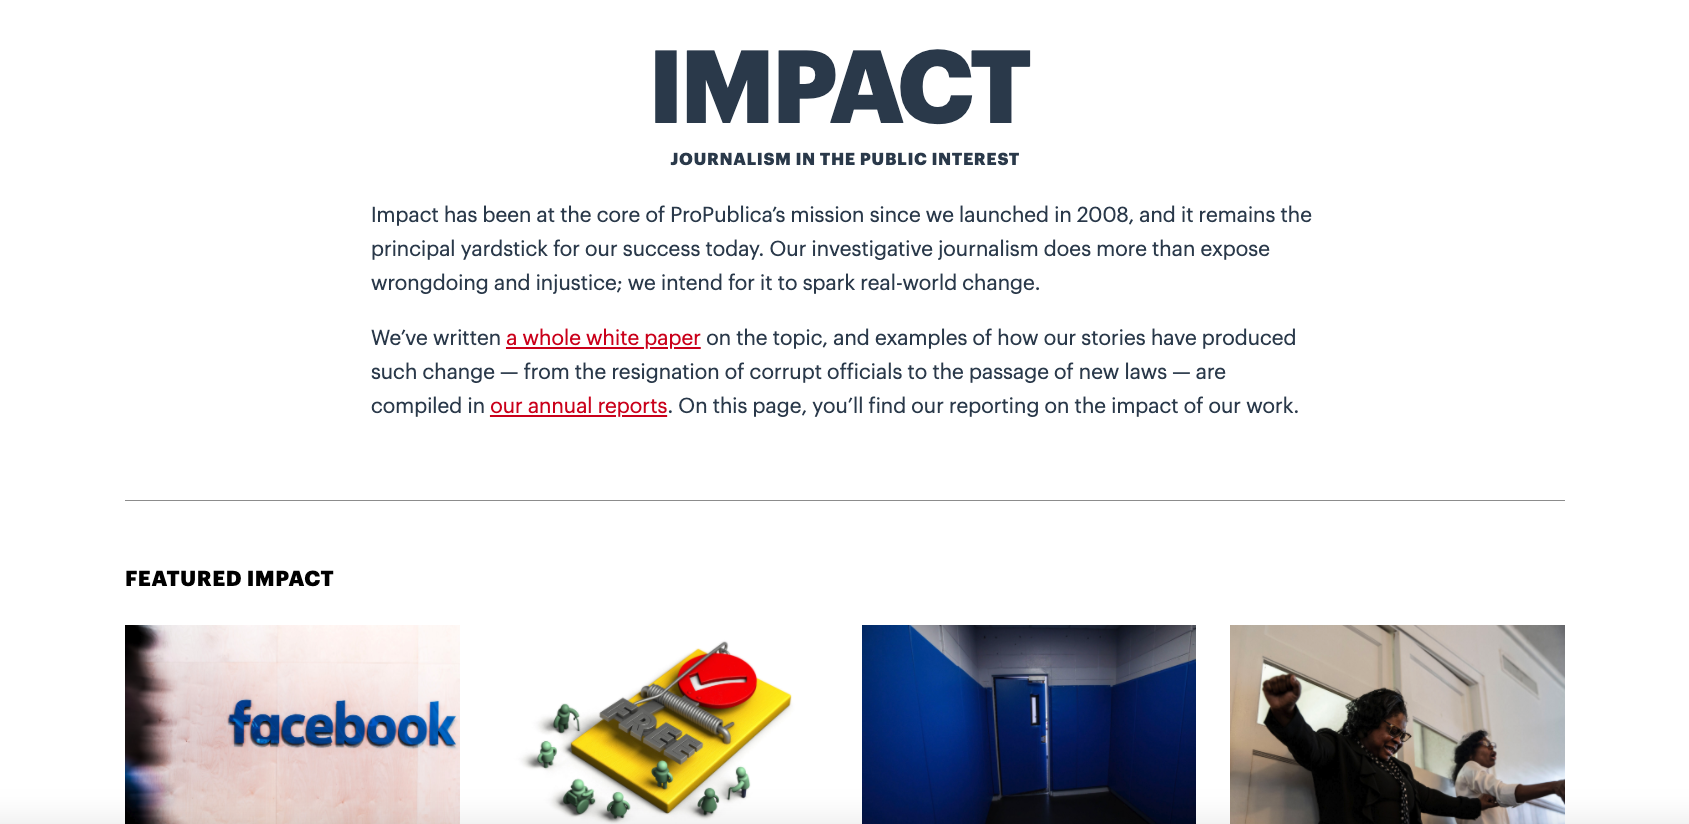 propublica-impact